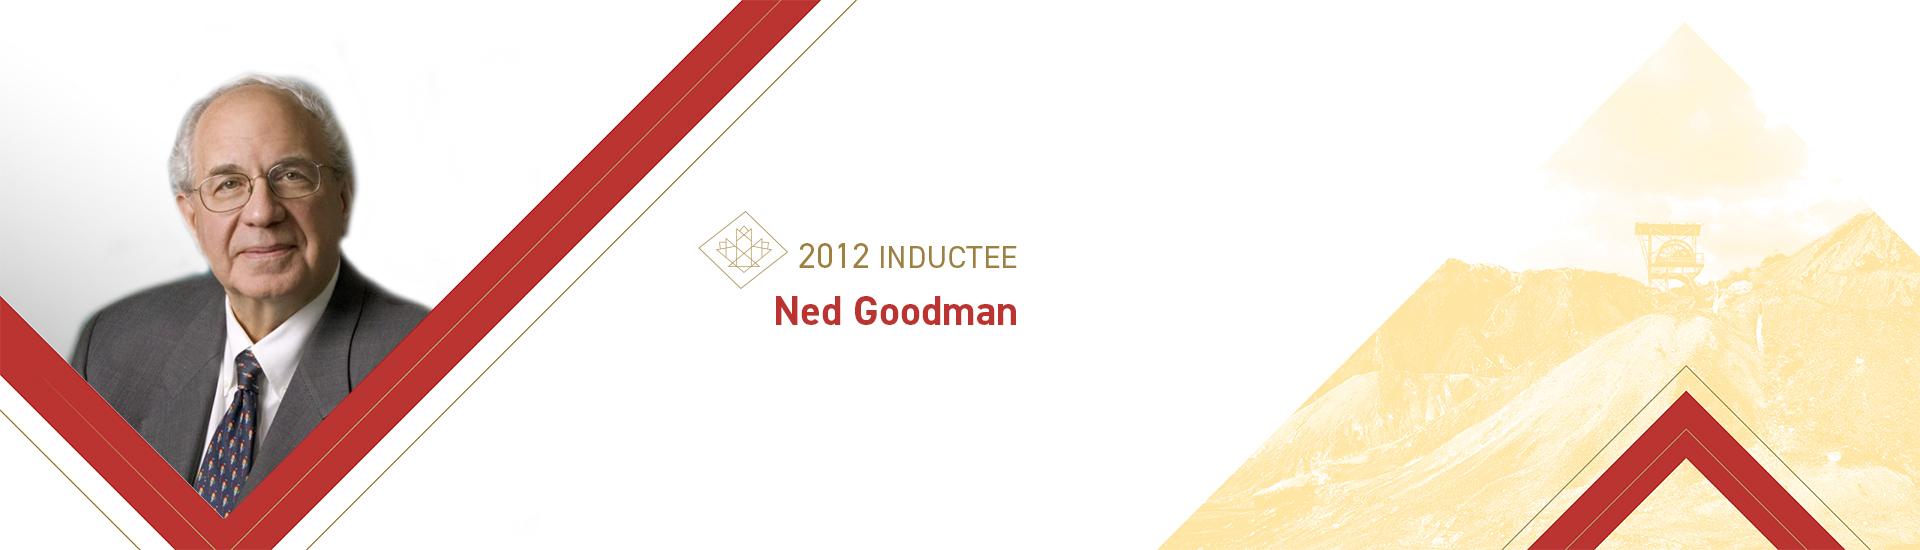 Ned Goodman (b. 1937)